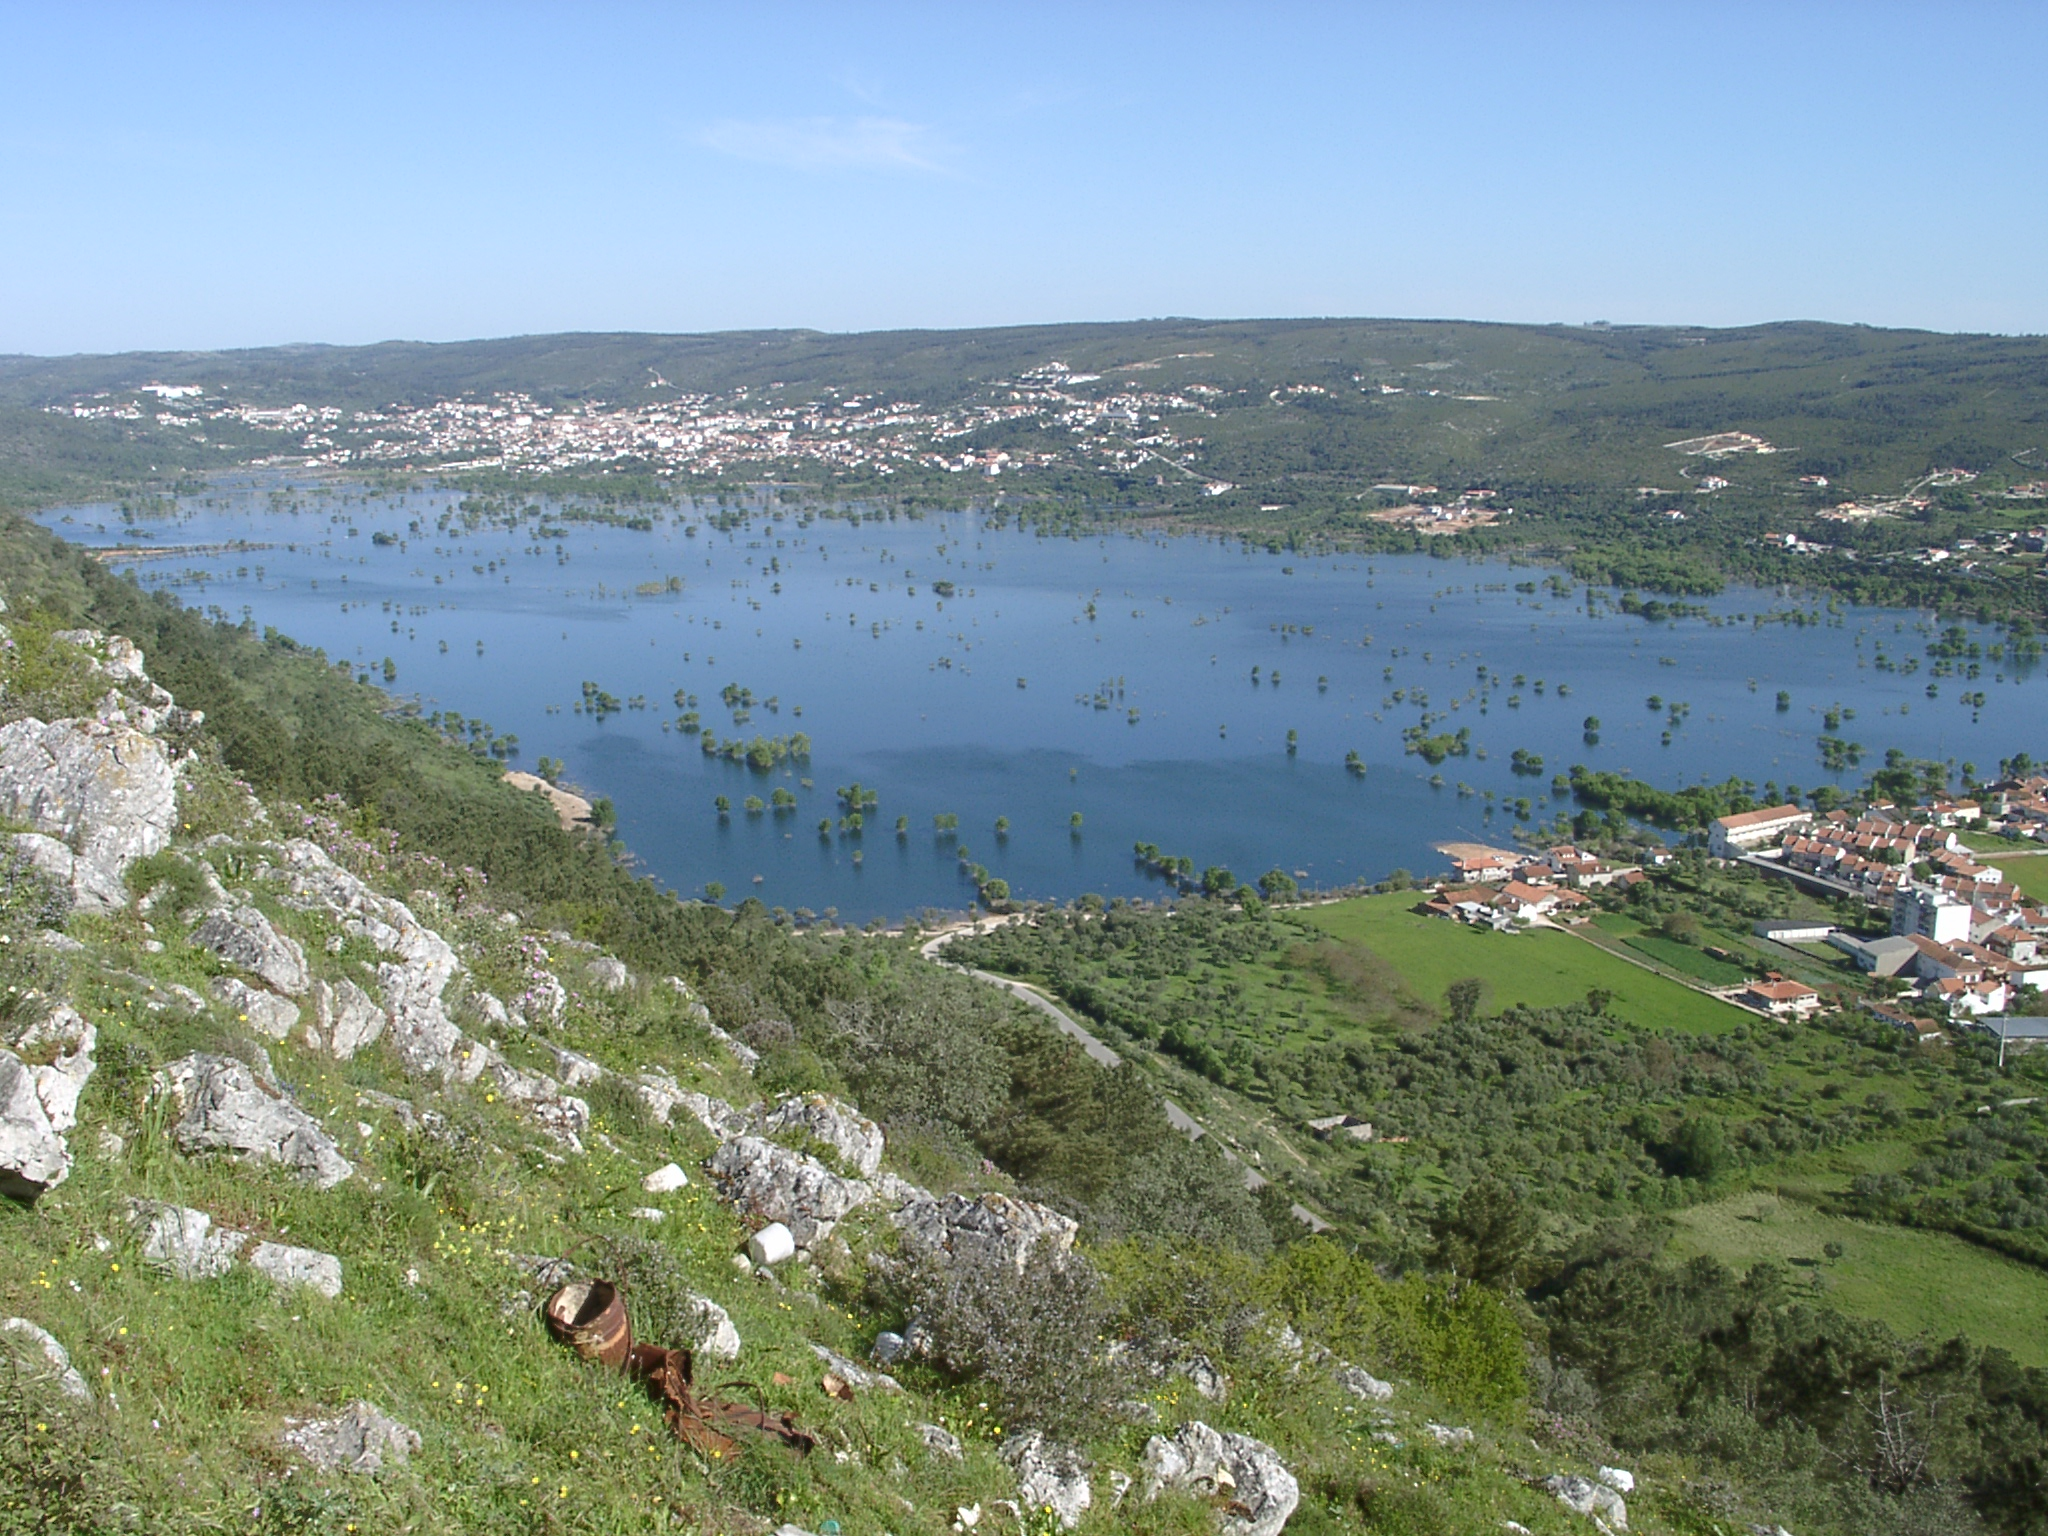 Parque natural das serras de aire e candeeiros wikiwand - Natura portugal ...